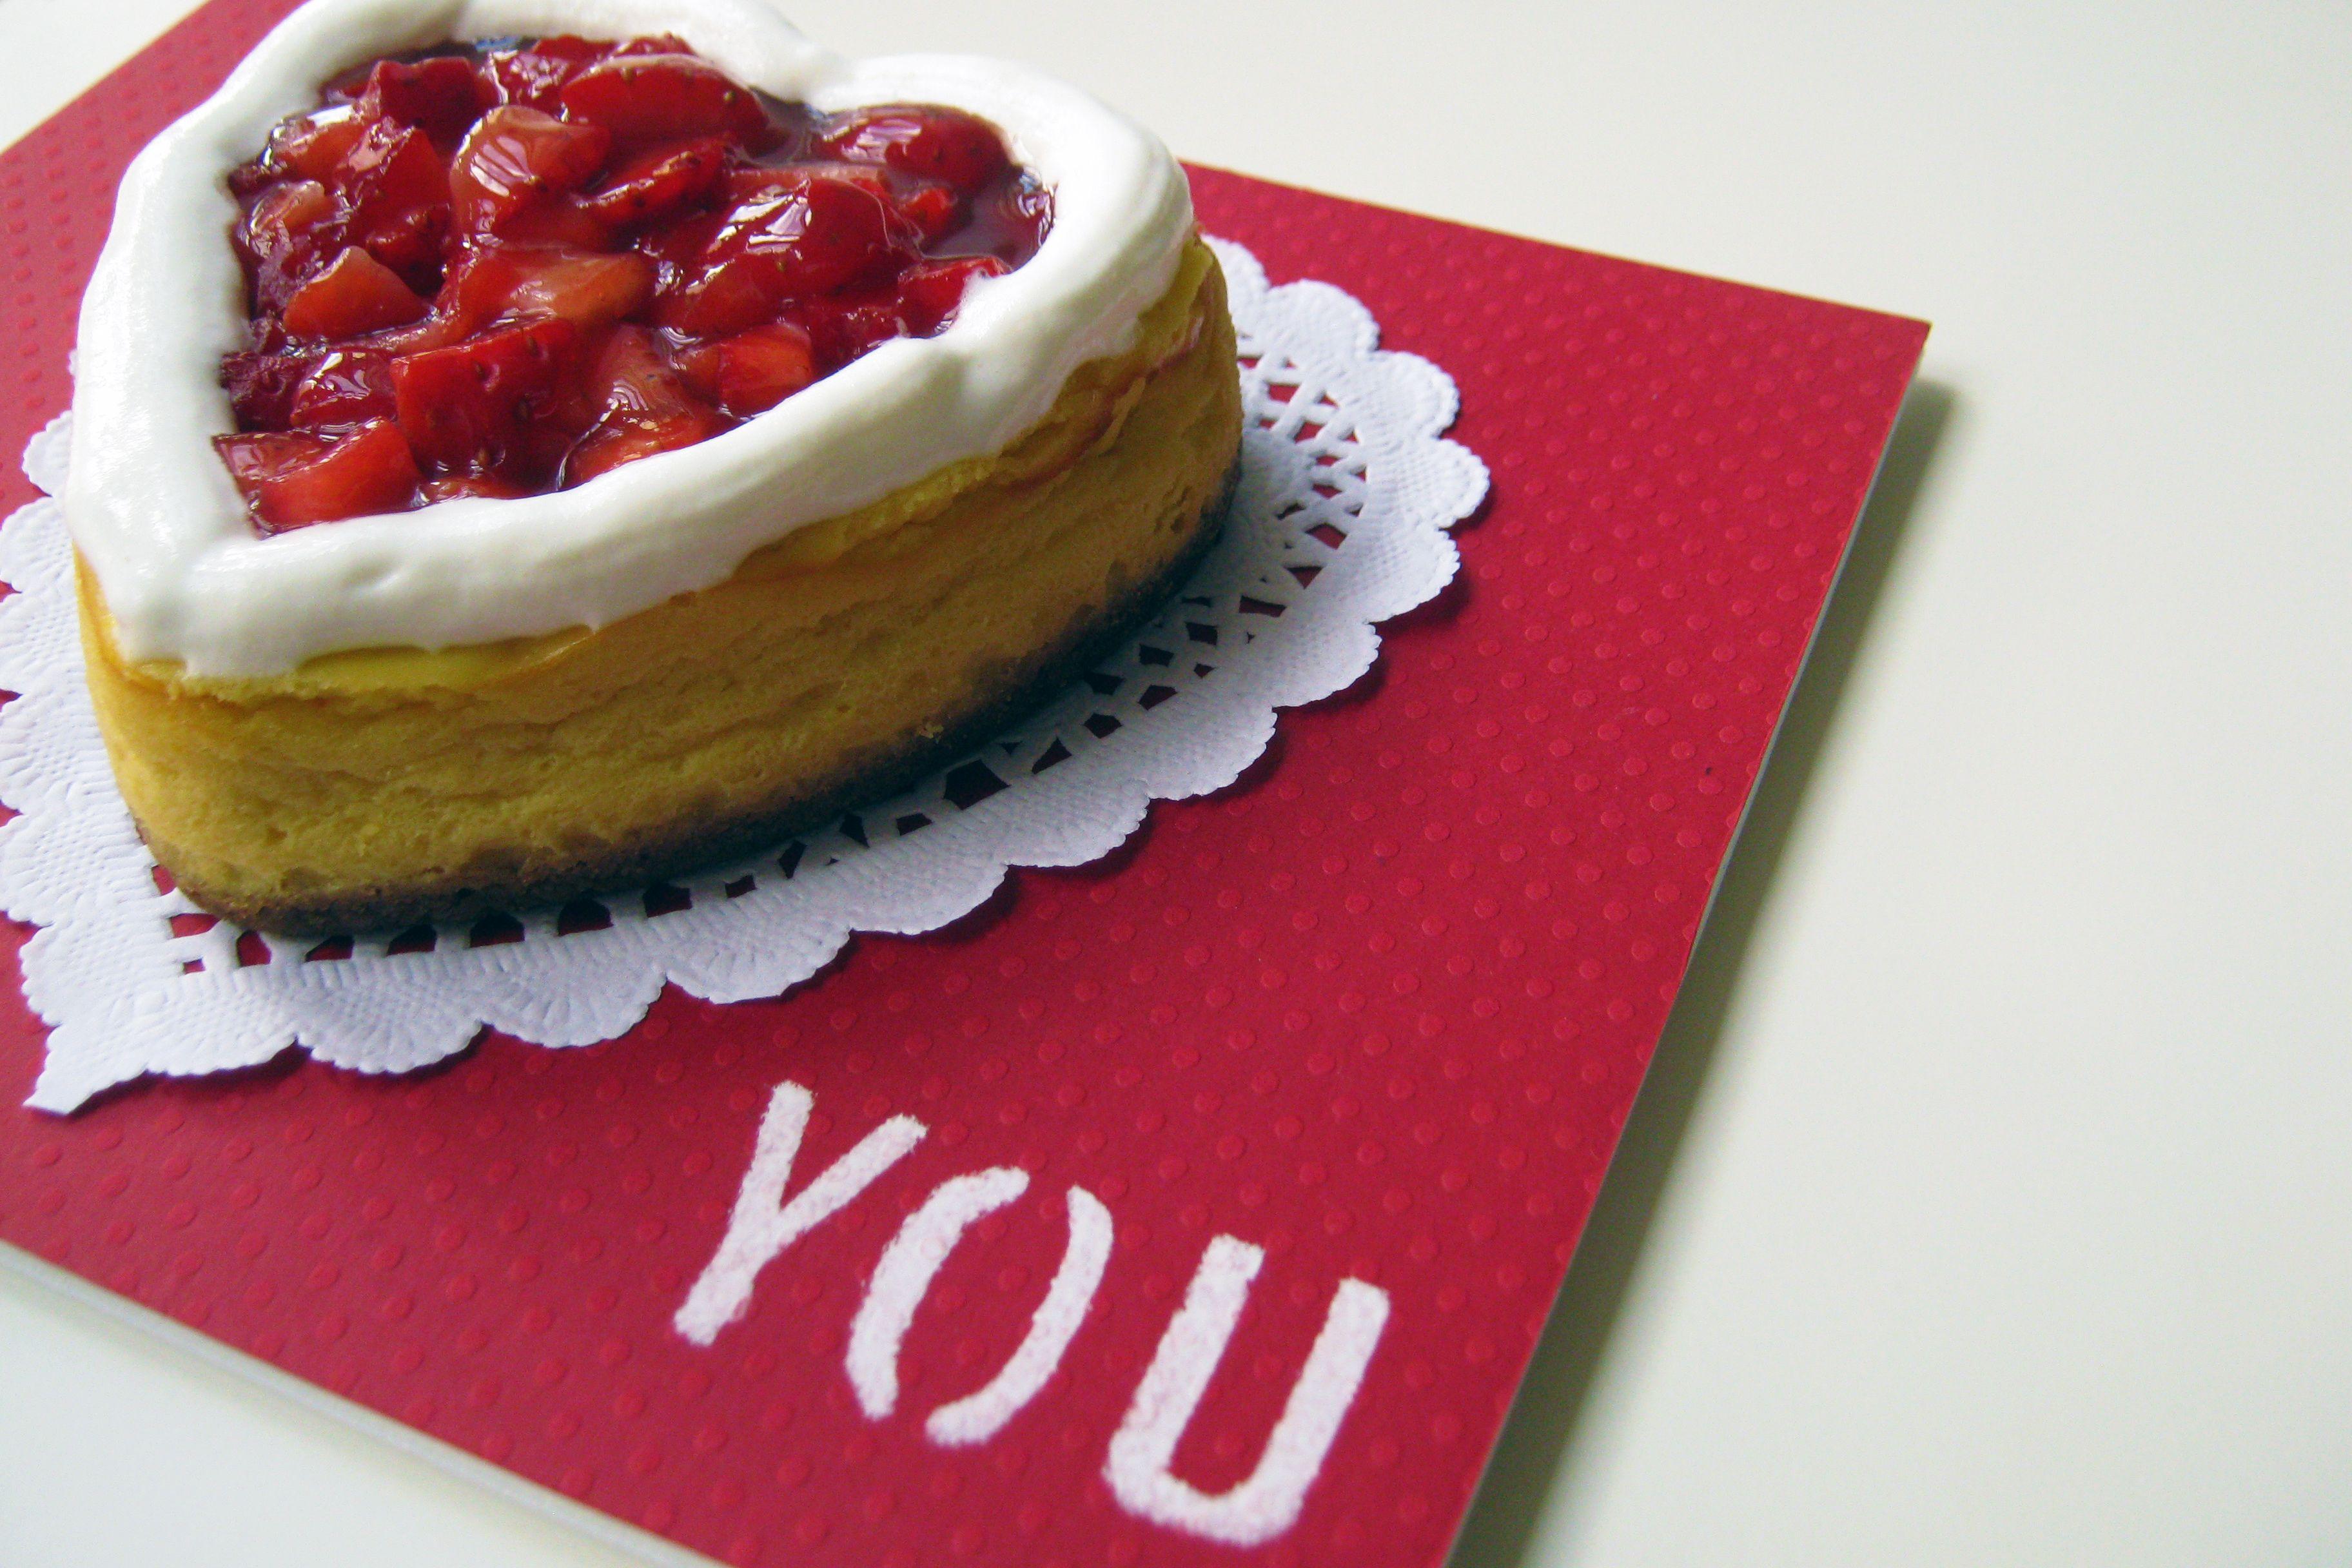 Cheesecake de Morangos e Natas do Dia dos Namorados  |  Valentine's Day Cheesecake